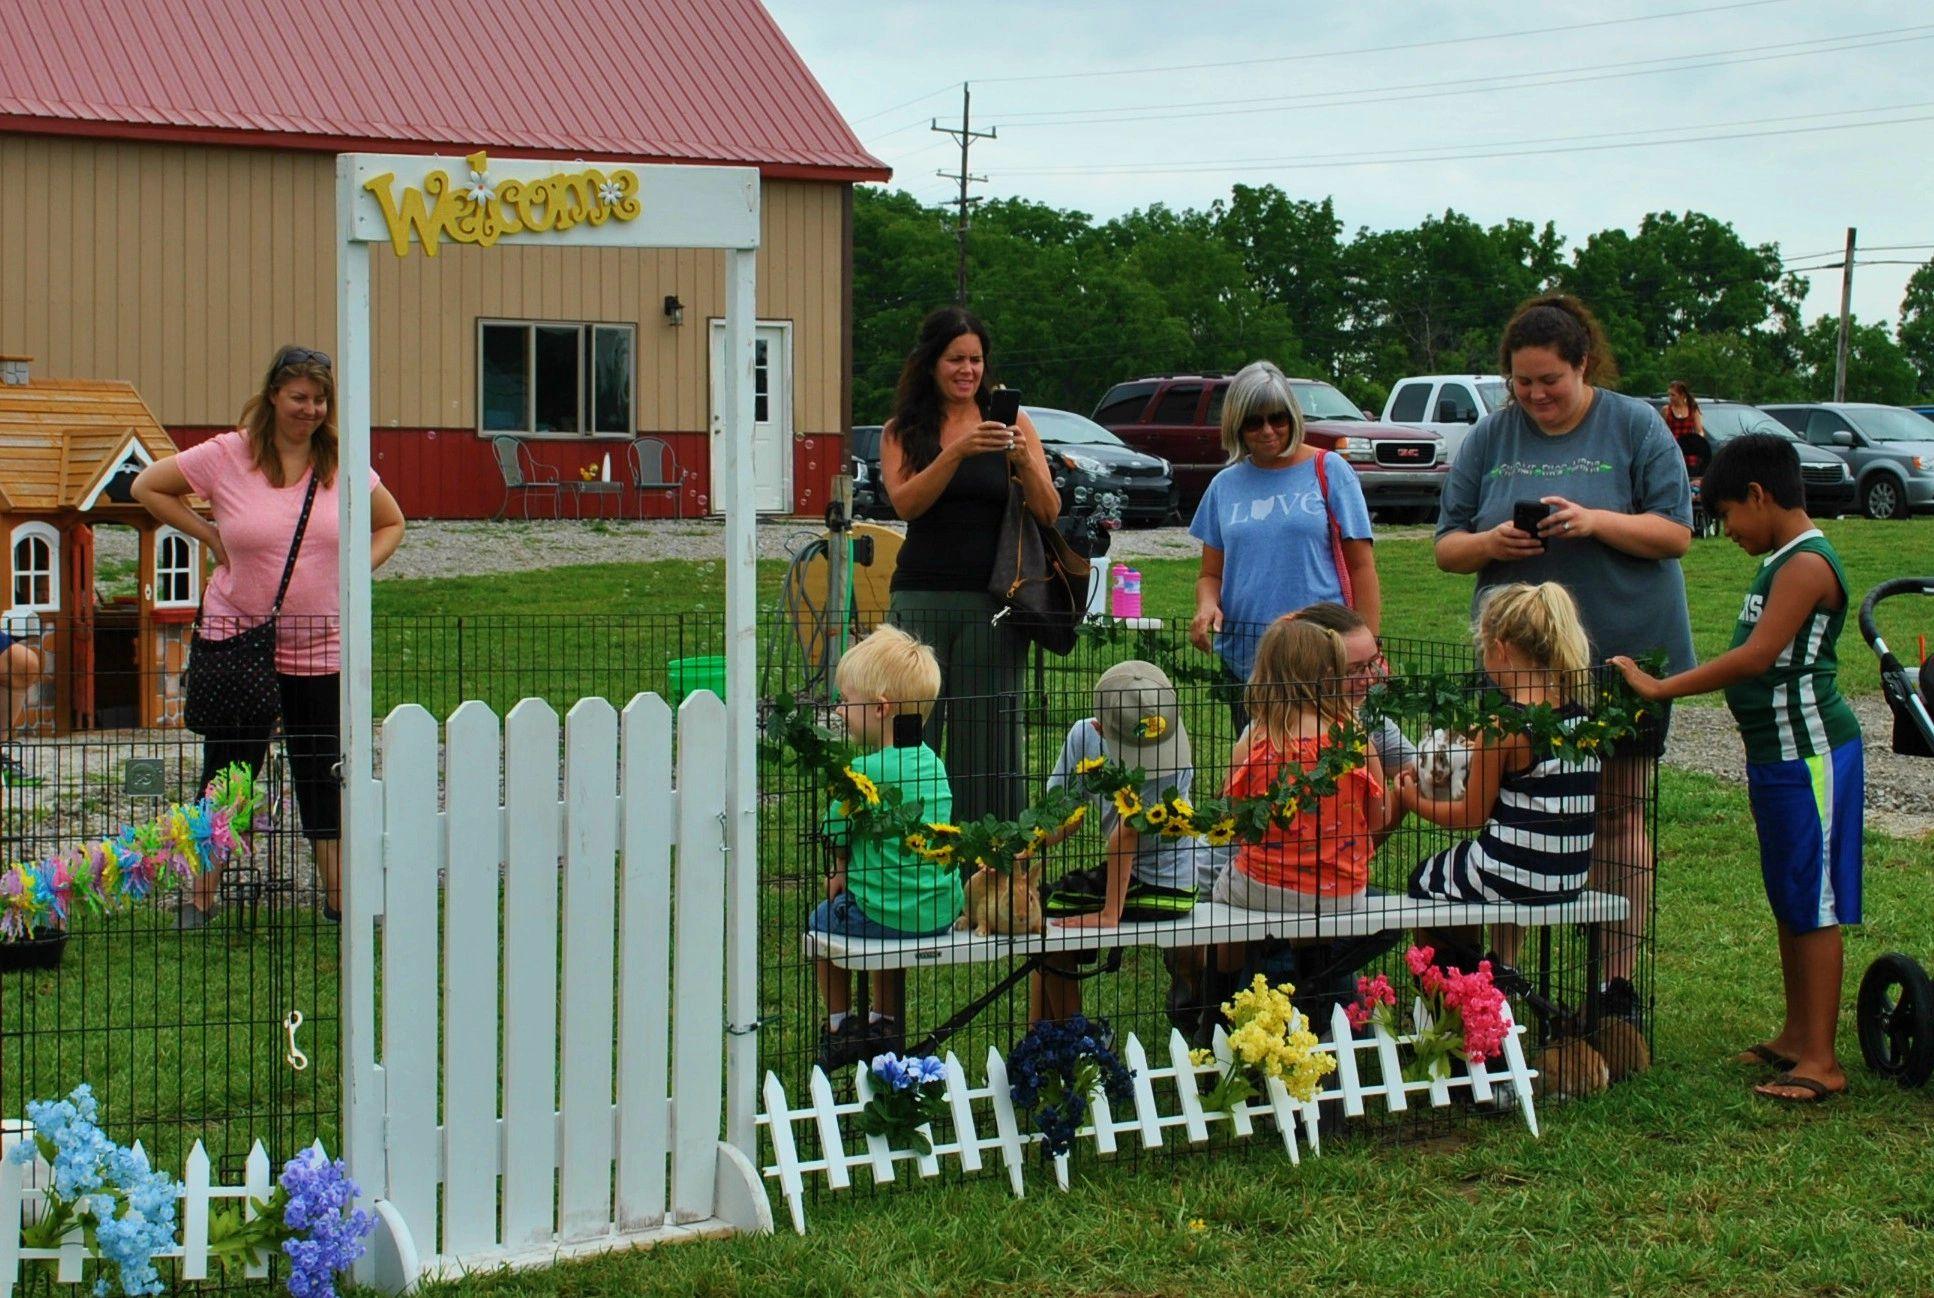 Duke Petting Farm and Carriage Company - Pony Rides, Petting